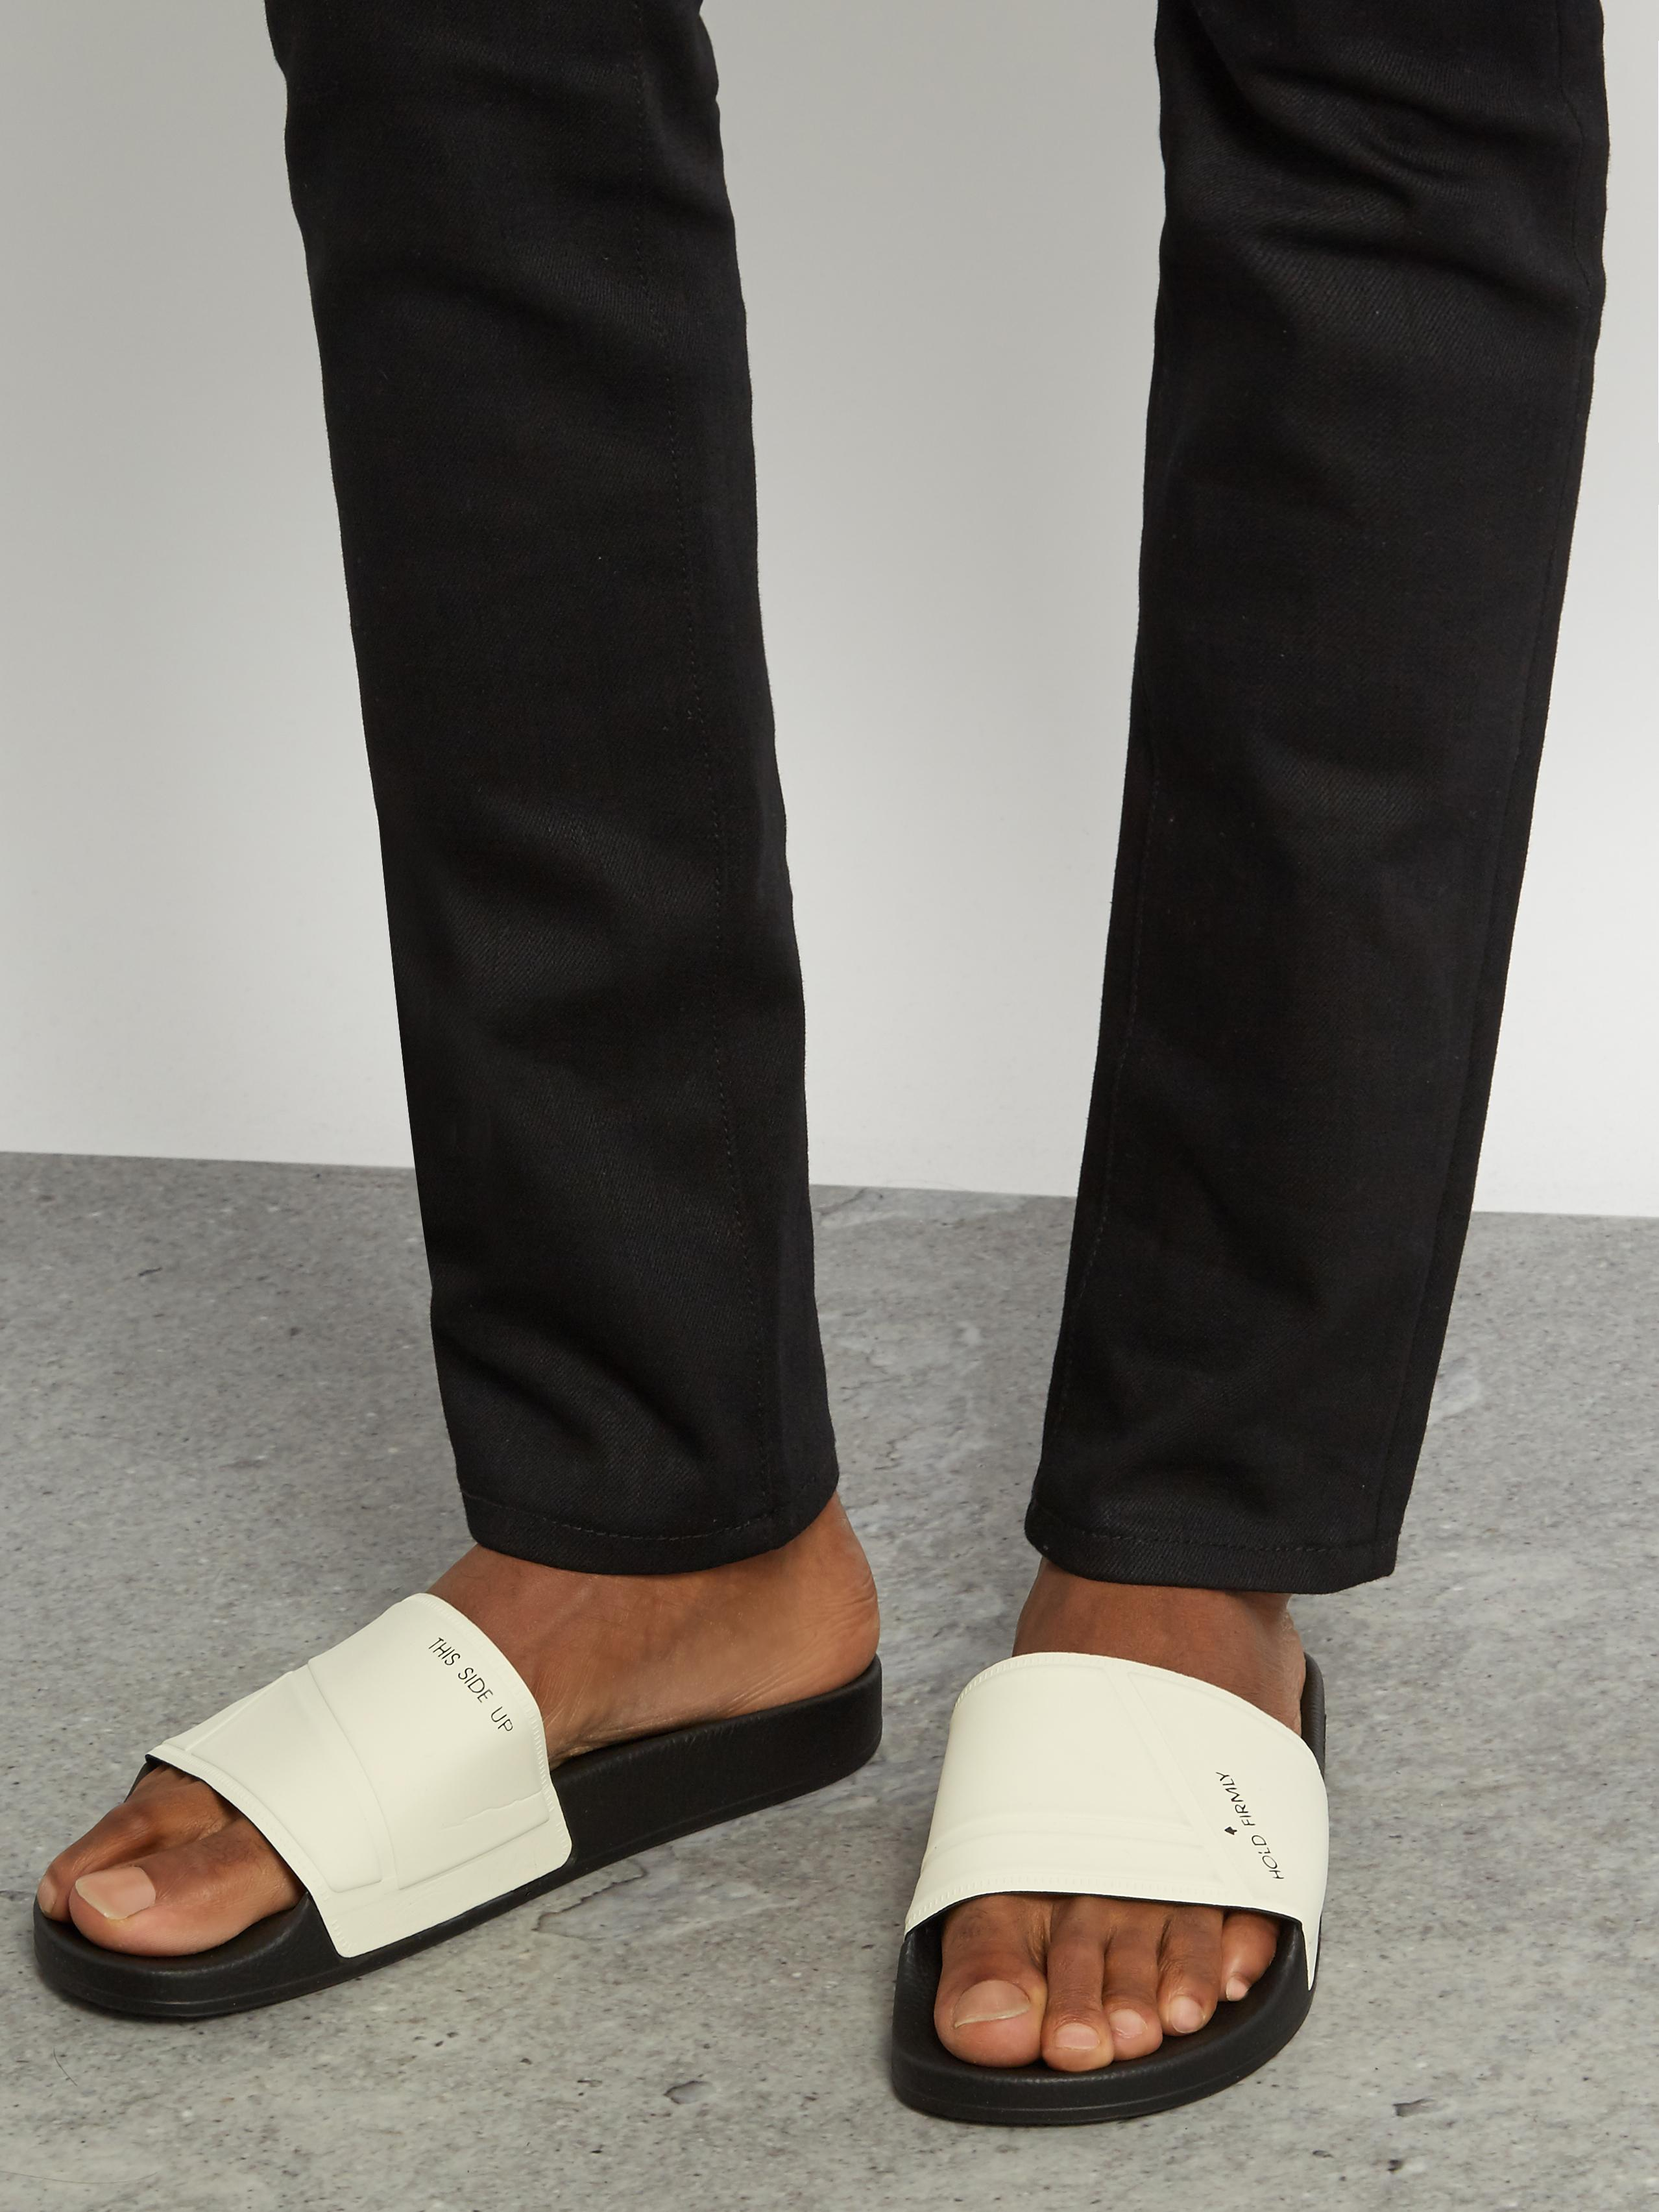 34dcfdbba Lyst - adidas By Raf Simons Bunny Adilette Pool Slides in Black for Men